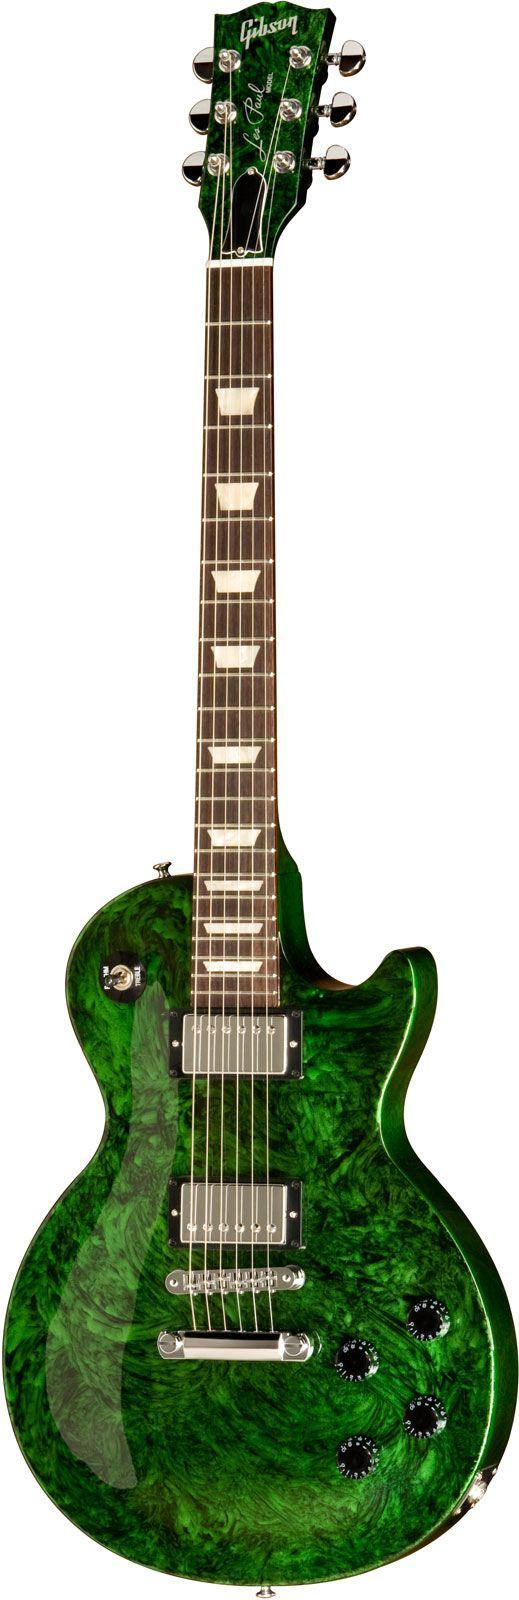 Gibson Anniversary Flood Les Paul Studio Green Swirl - <3'd by Stringjoy Custom Guitar & Bass Strings